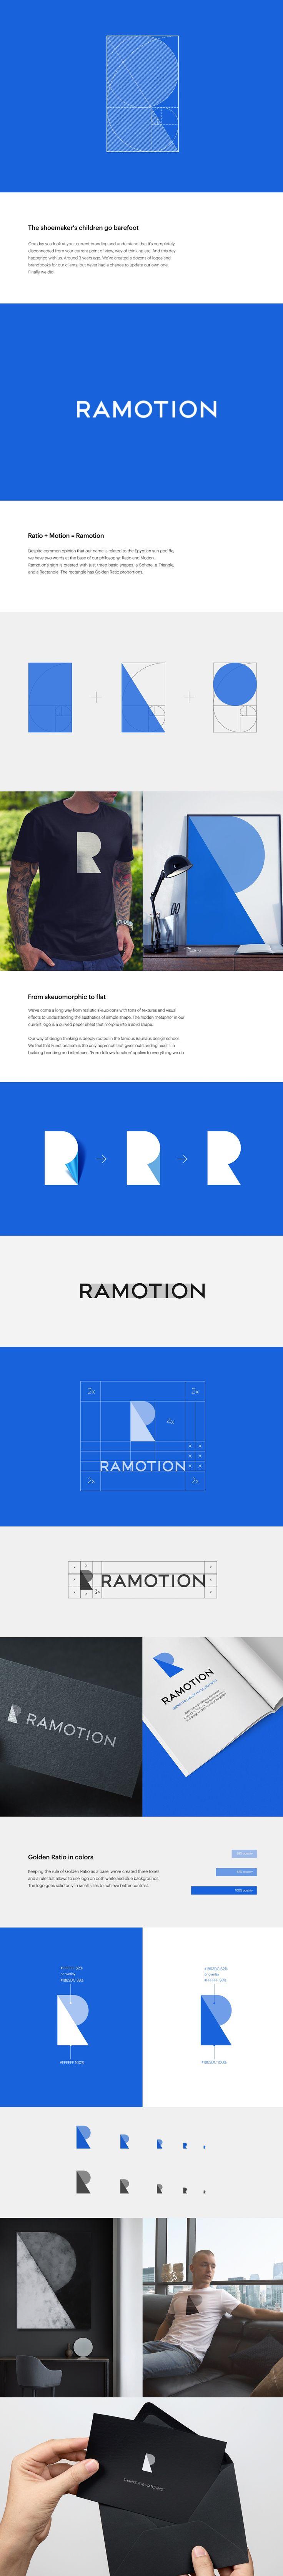 Ramotion.com Rebranding ⠀⠀⠀⠀⠀⠀⠀⠀⠀ ⠀⠀⠀⠀⠀⠀⠀⠀⠀ ⠀⠀⠀⠀⠀⠀⠀⠀⠀ ⠀⠀⠀⠀⠀⠀⠀⠀⠀ #logo…